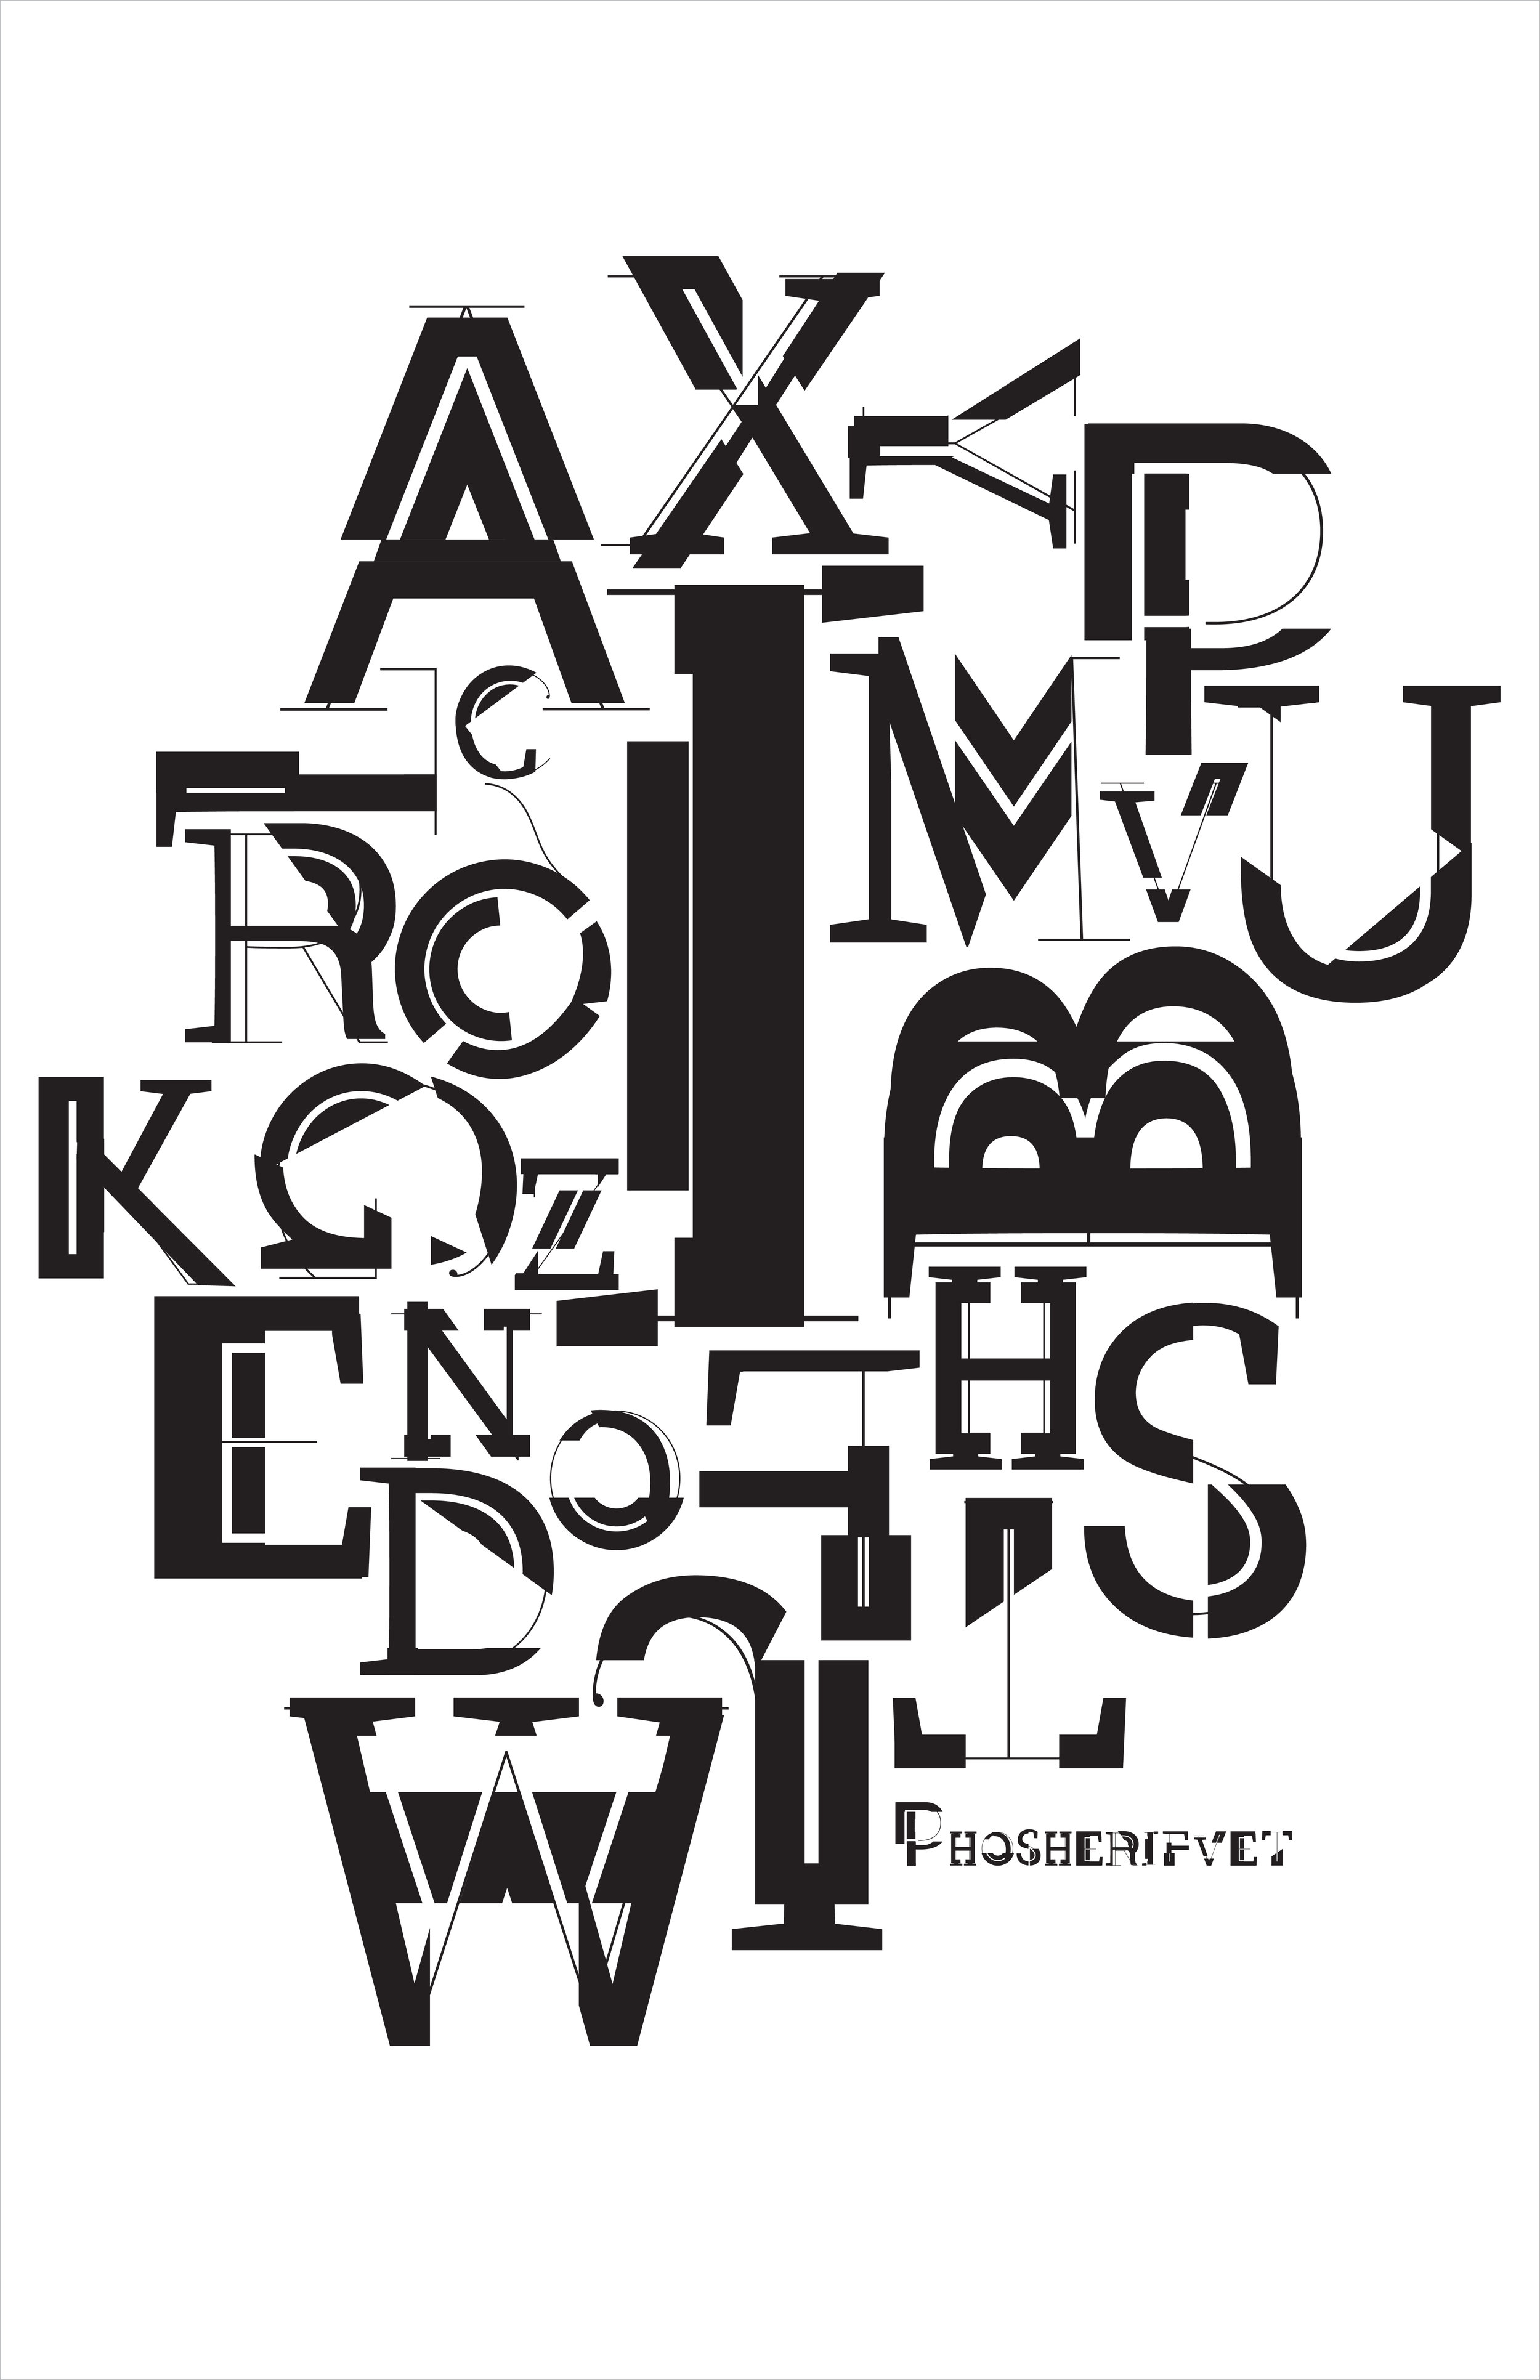 ART327 Advanced Typography - Frankenstein Typeface: Jessica McCool